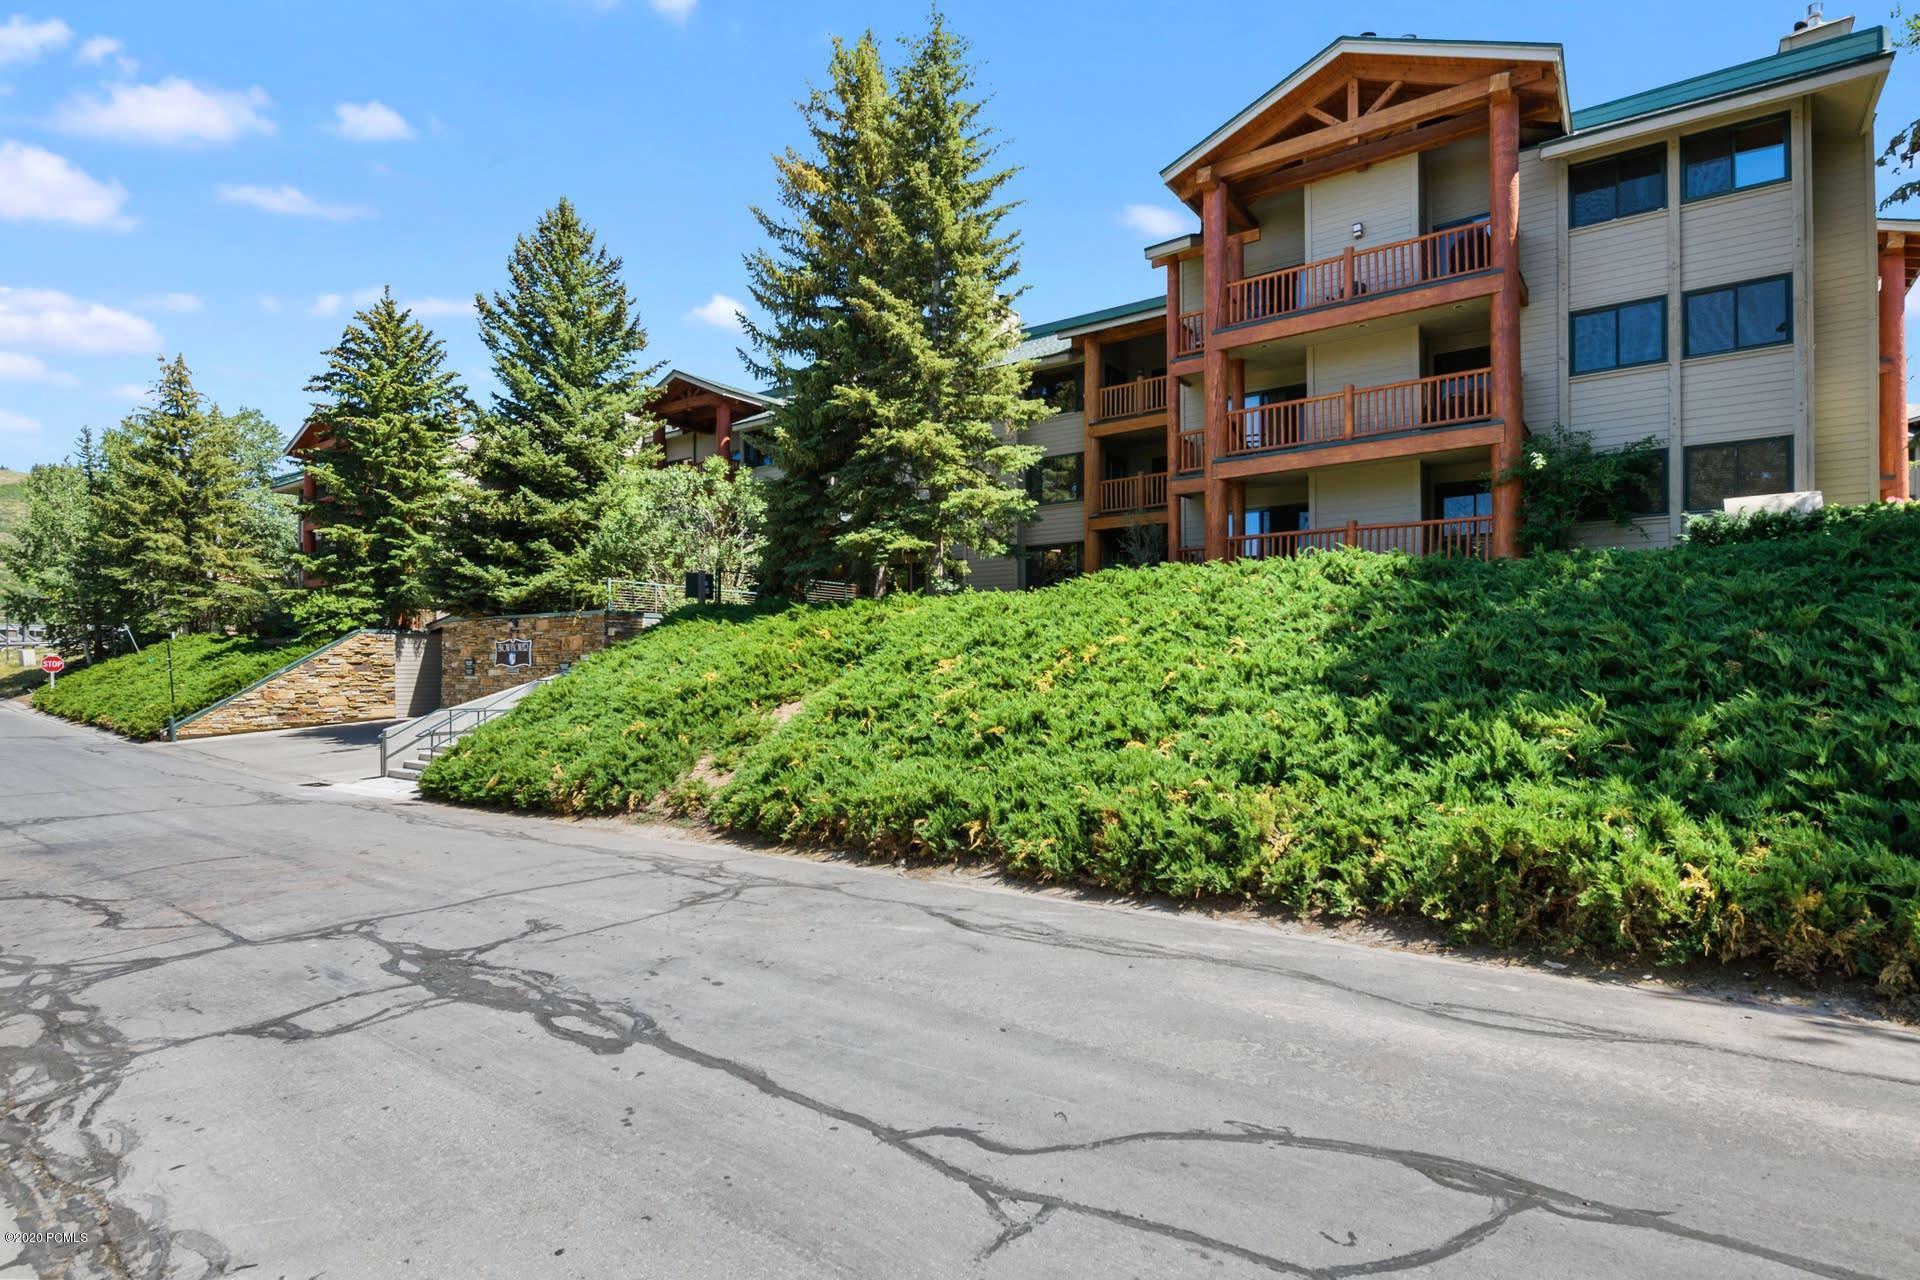 401 Silver King Drive, Park City, Utah 84060, 3 Bedrooms Bedrooms, ,Condominium,For Sale,Silver King,12002707